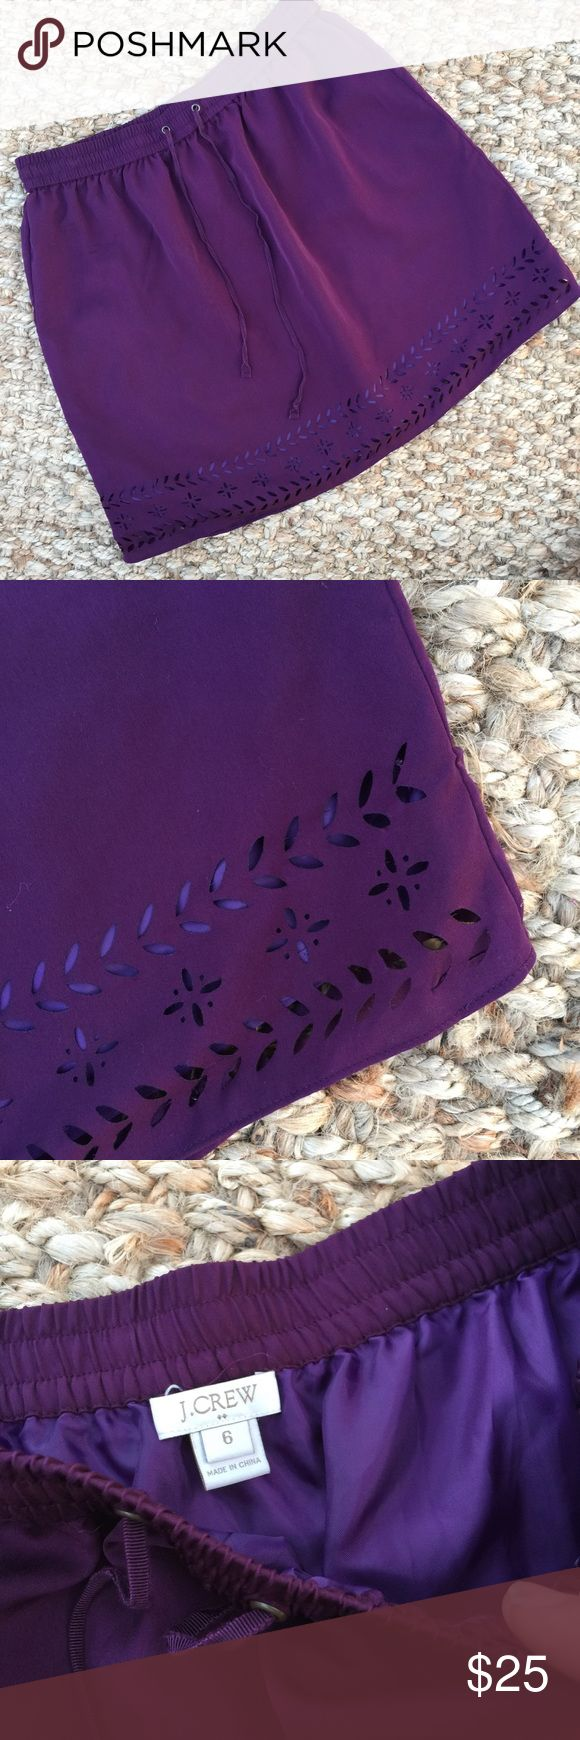 J Crew Factory Laser Cut Skirt Drawstring with elastic waist. Great plum color! J. Crew Factory Skirts Mini